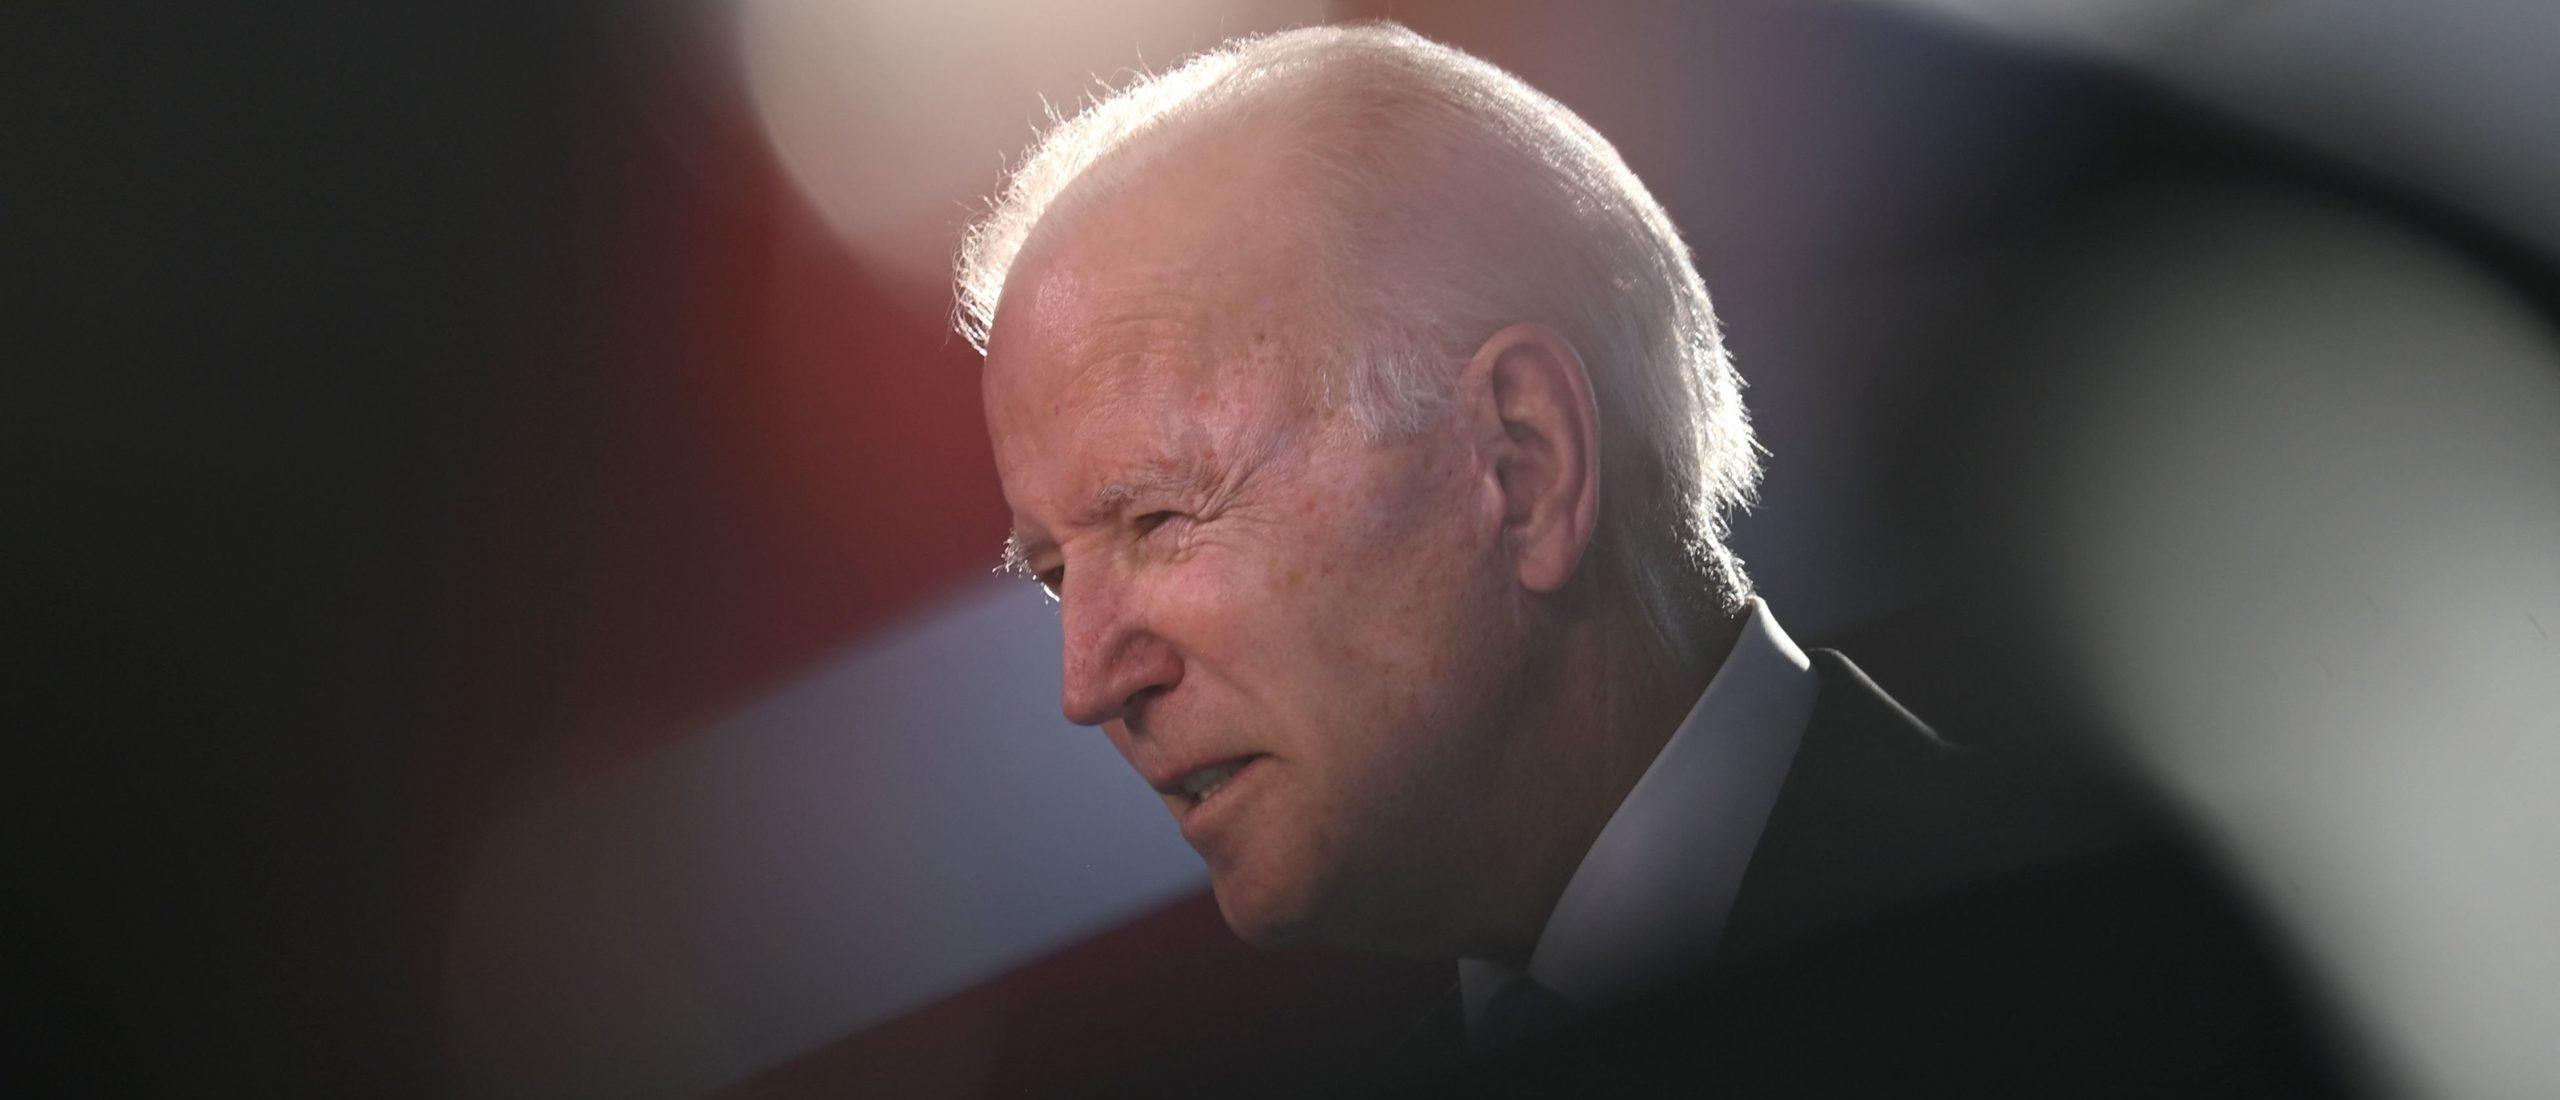 Top Republican Requests IG Probe Into Biden's Potentially 'Unlawful Actions' Placing Activists In Regulatory Agency